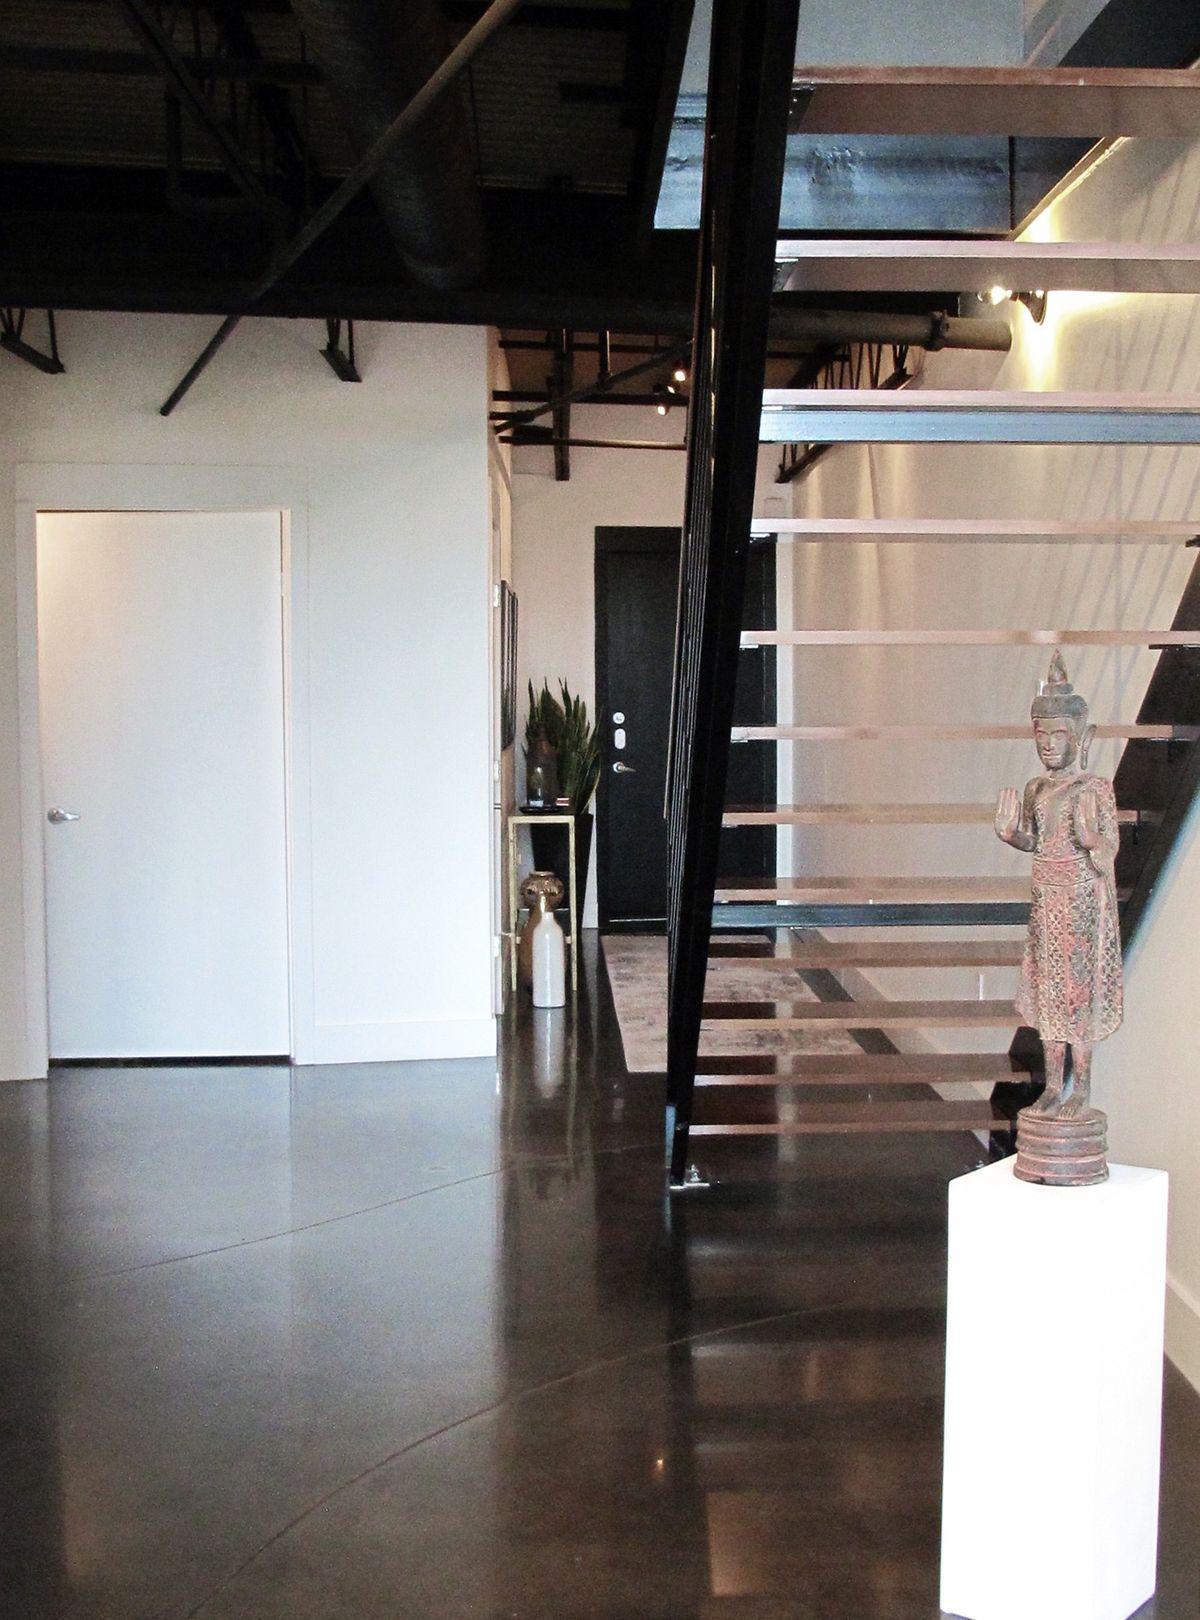 Maryland Loft Home Photo Video Shoot Location Dallas 11.jpg